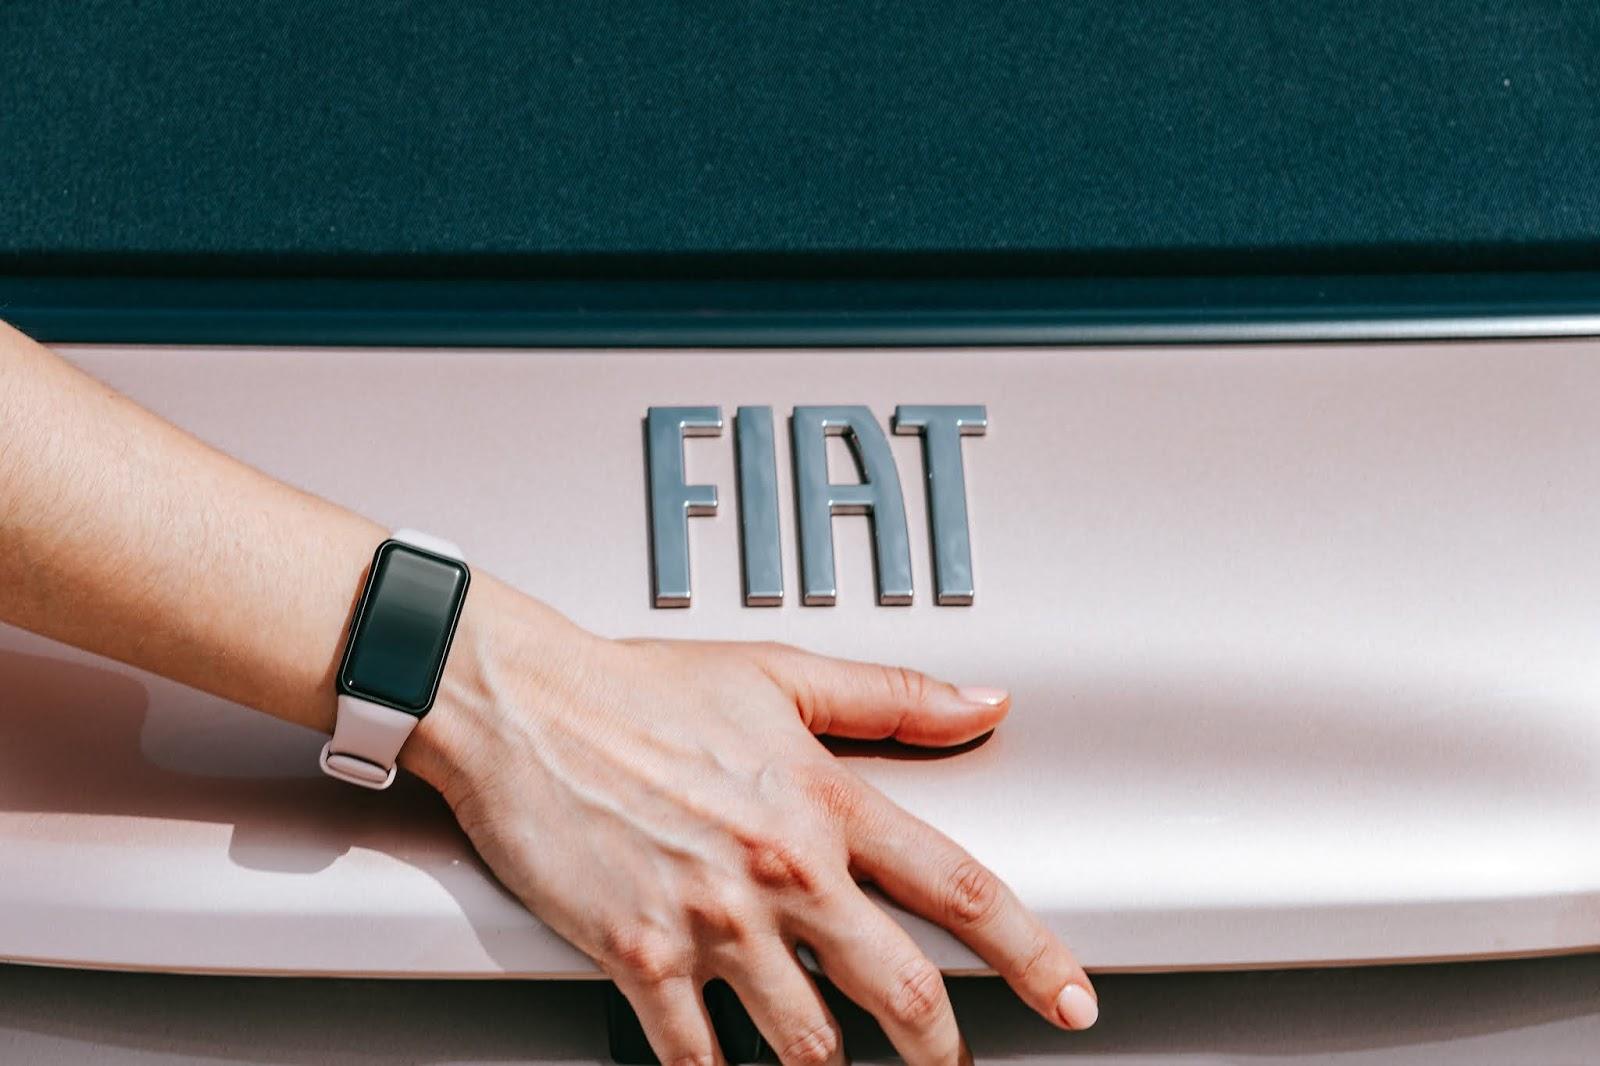 20210507img 2838 609cf1810861a 1 Honor Band 6 & Fiat 500e : Στιλ και Τεχνολογία με επίκεντρο τον άνθρωπο